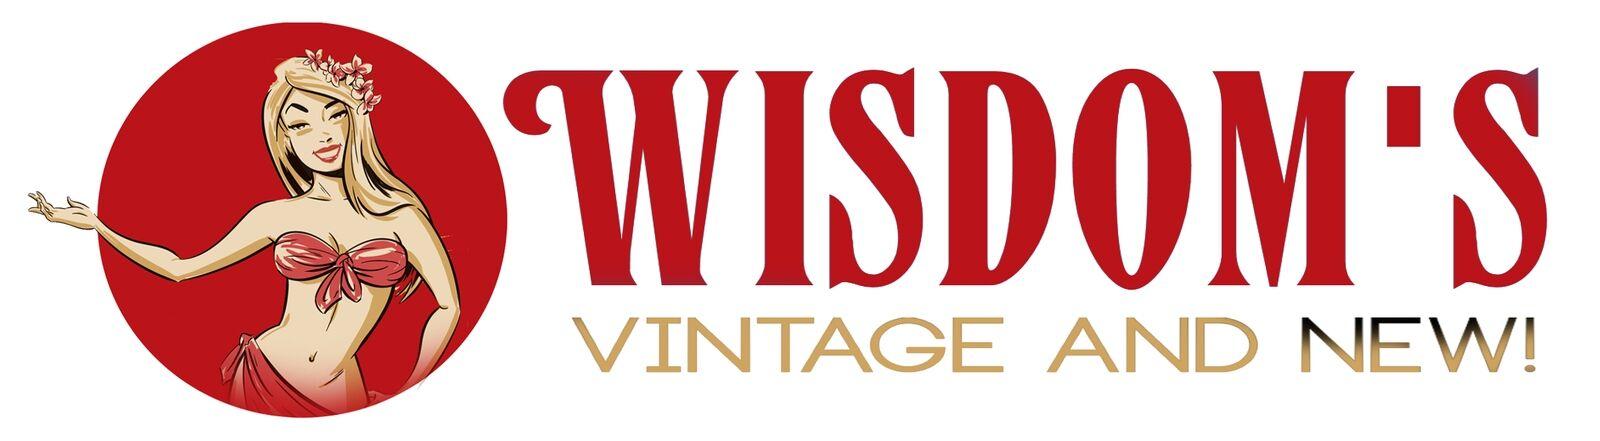 Wisdom'sVintage&New